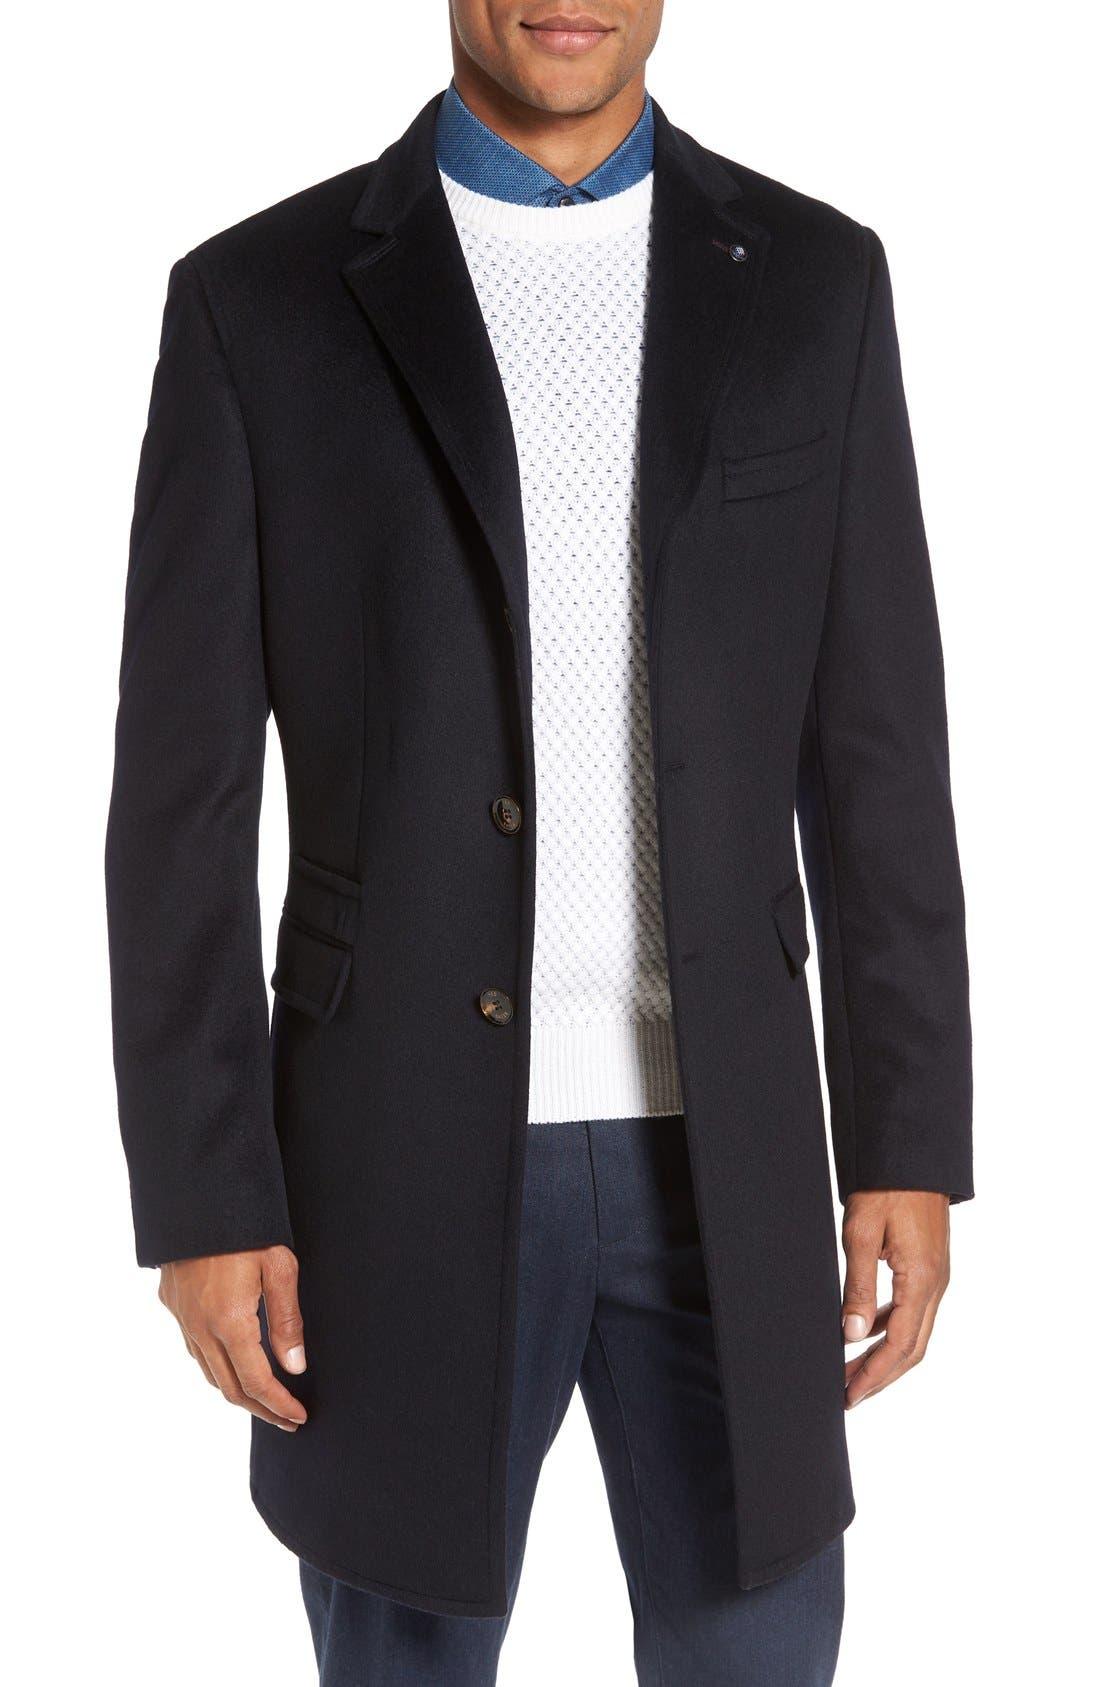 Alternate Image 1 Selected - Ted Baker London Alaska Trim Fit Wool & Cashmere Overcoat